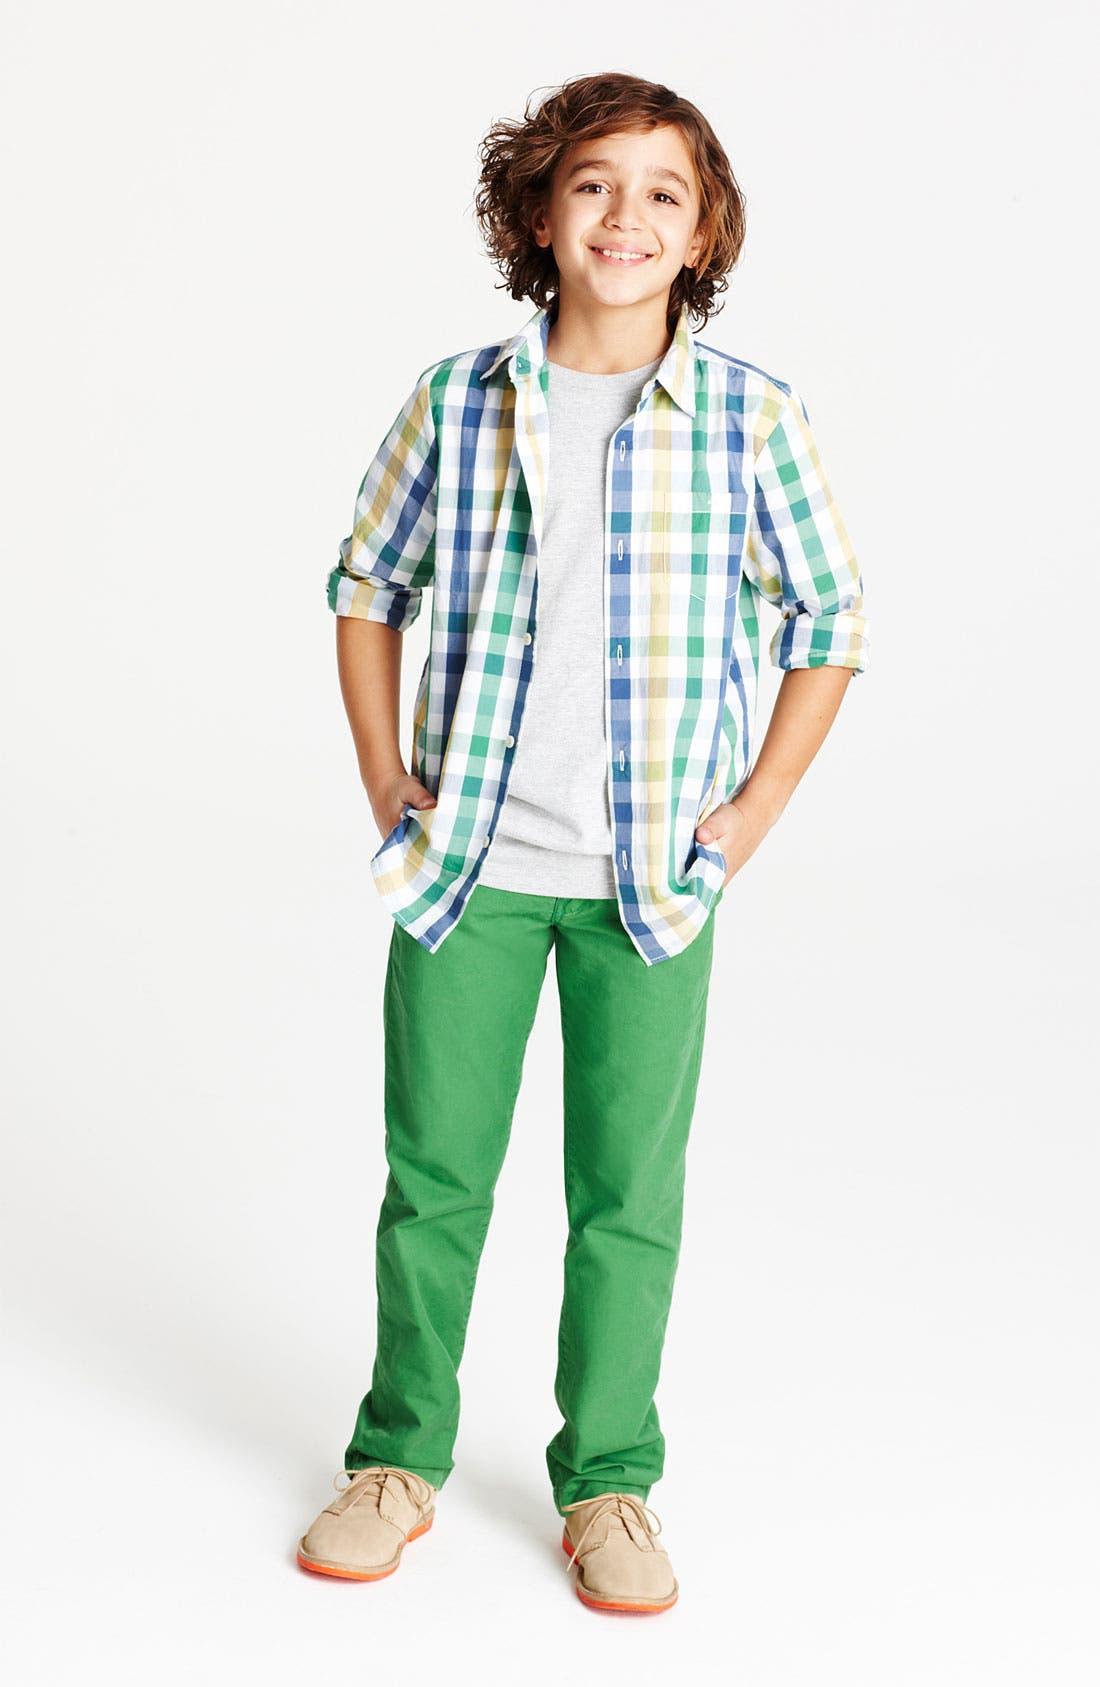 Main Image - Tucker + Tate Poplin Shirt, T-Shirt, Chino Pants & Boot (Big Boys)